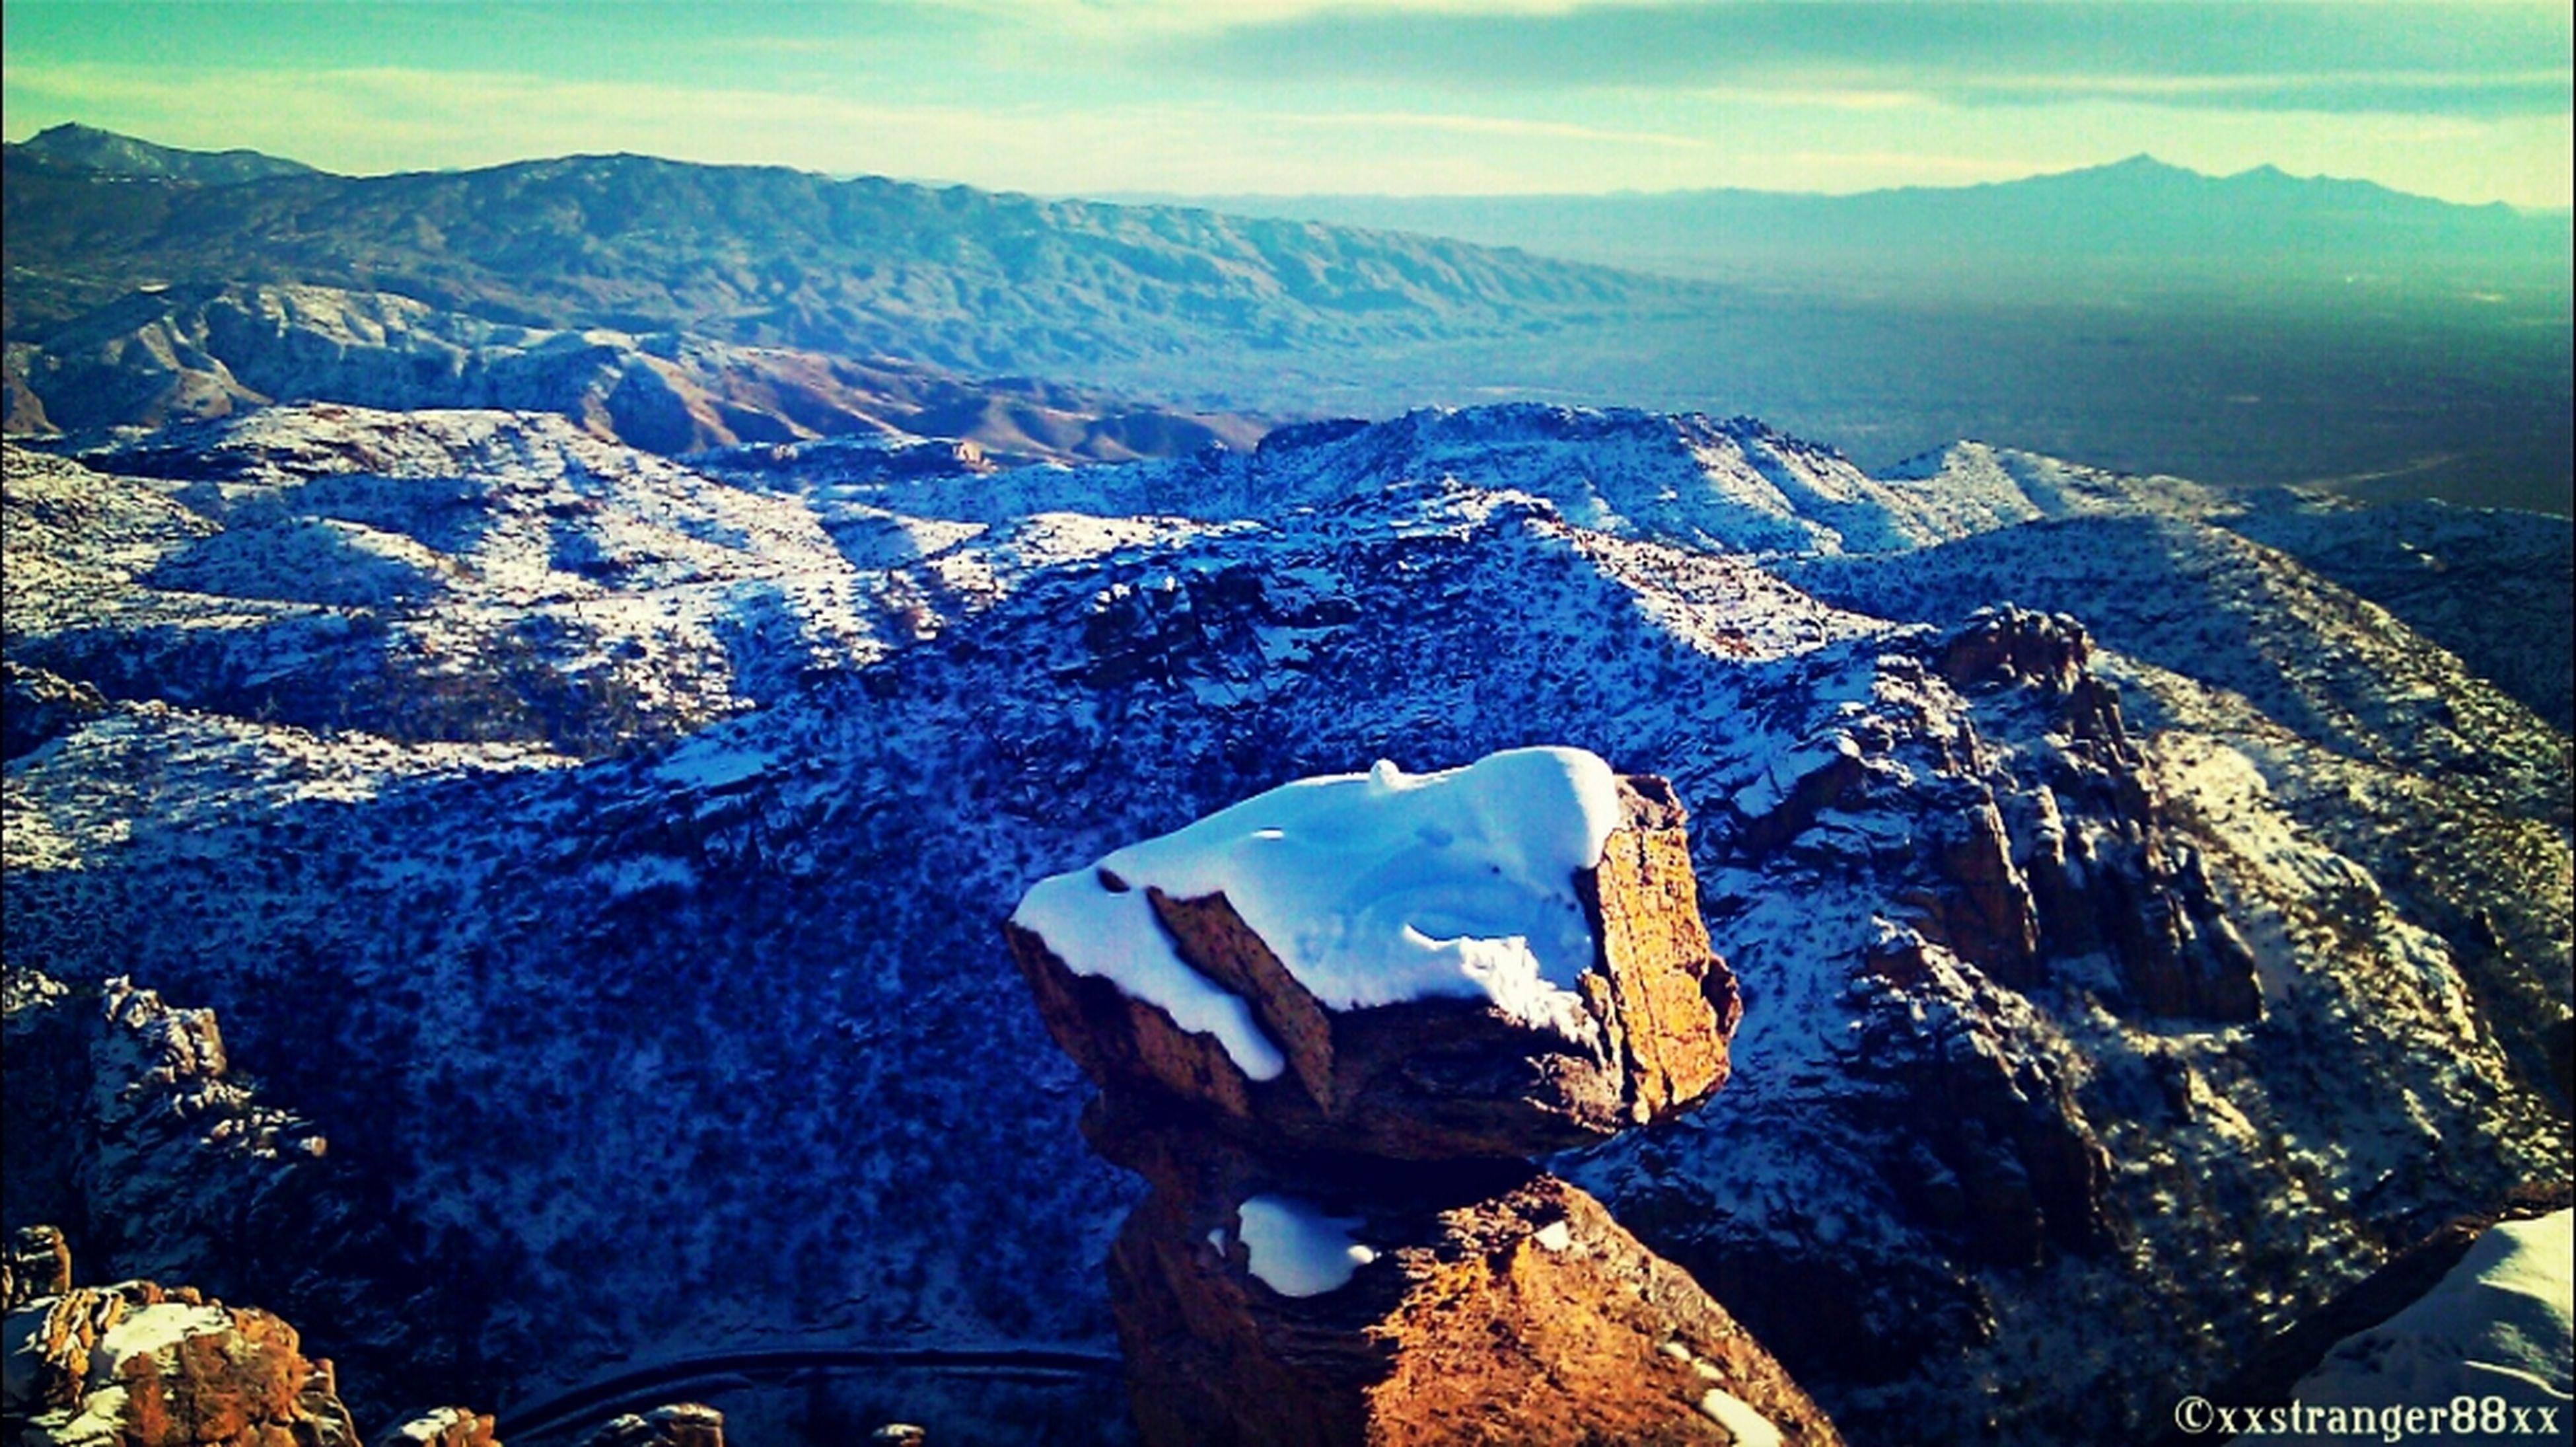 mountain, mountain range, snow, winter, scenics, cold temperature, tranquil scene, beauty in nature, tranquility, snowcapped mountain, landscape, nature, sky, water, non-urban scene, season, lake, high angle view, idyllic, mountain peak